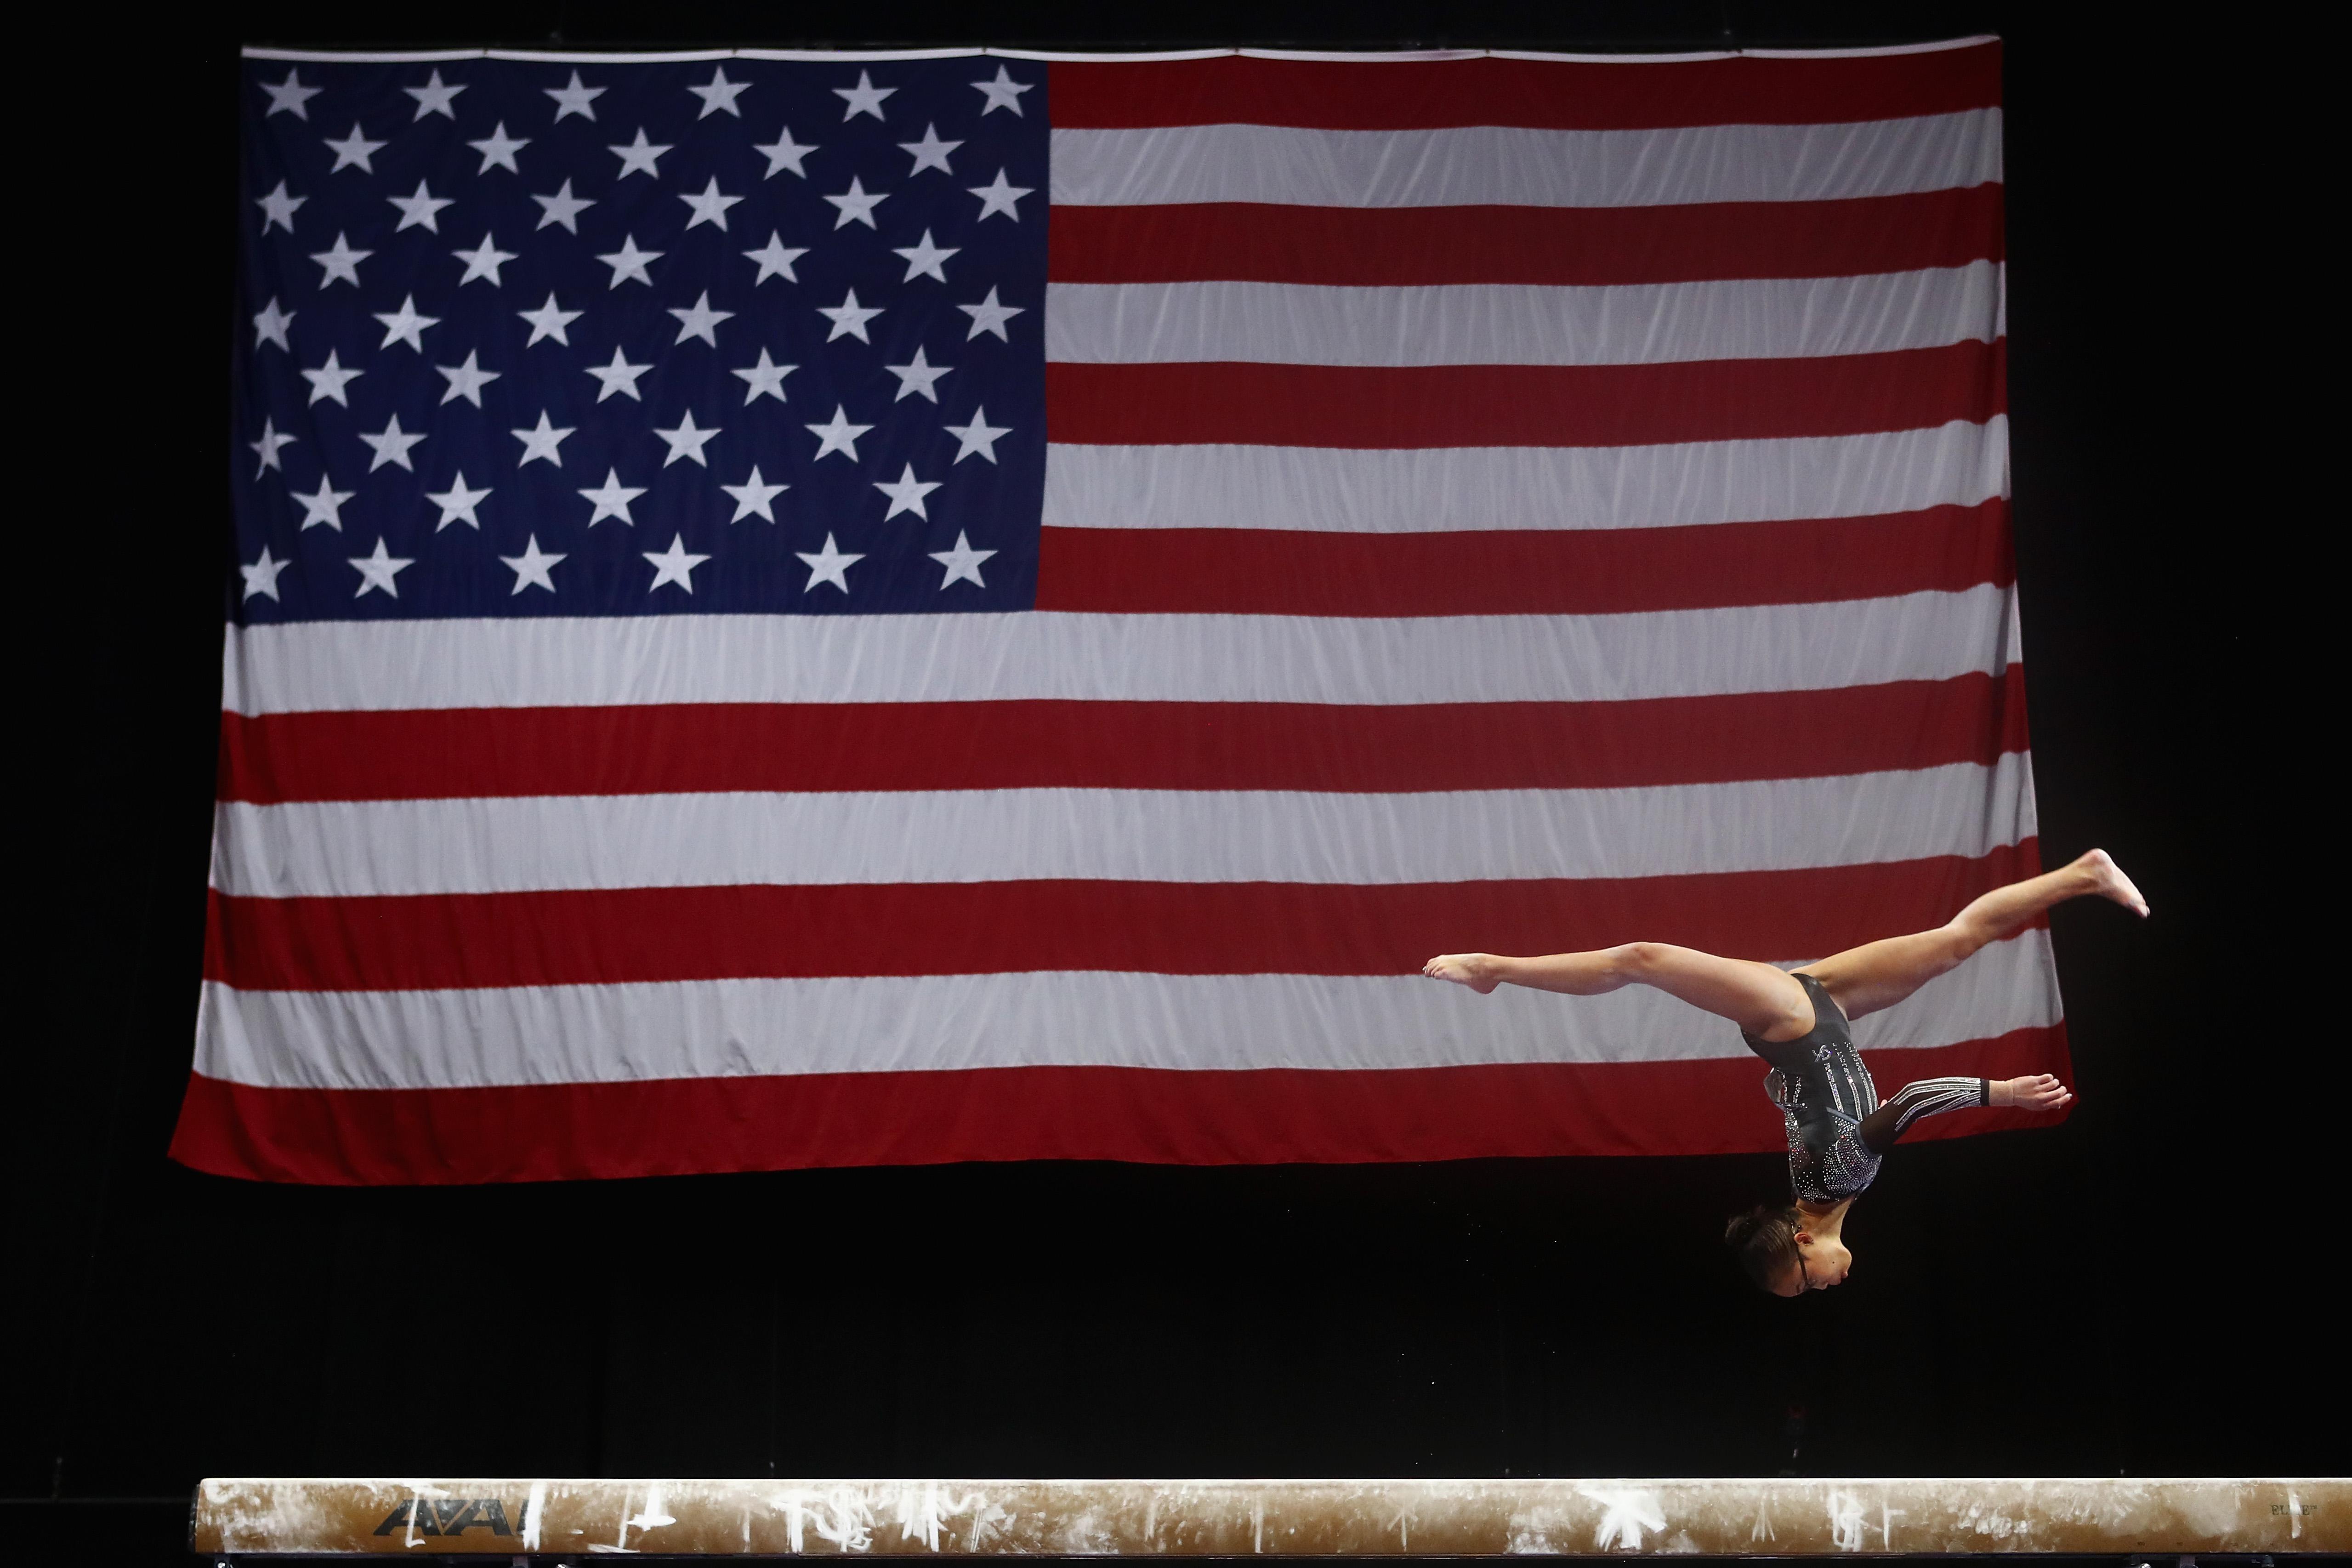 An American gymnast on the balance beam during the U.S. Gymnastics Championships on Aug. 19, 2018 in Boston, Massachusetts.